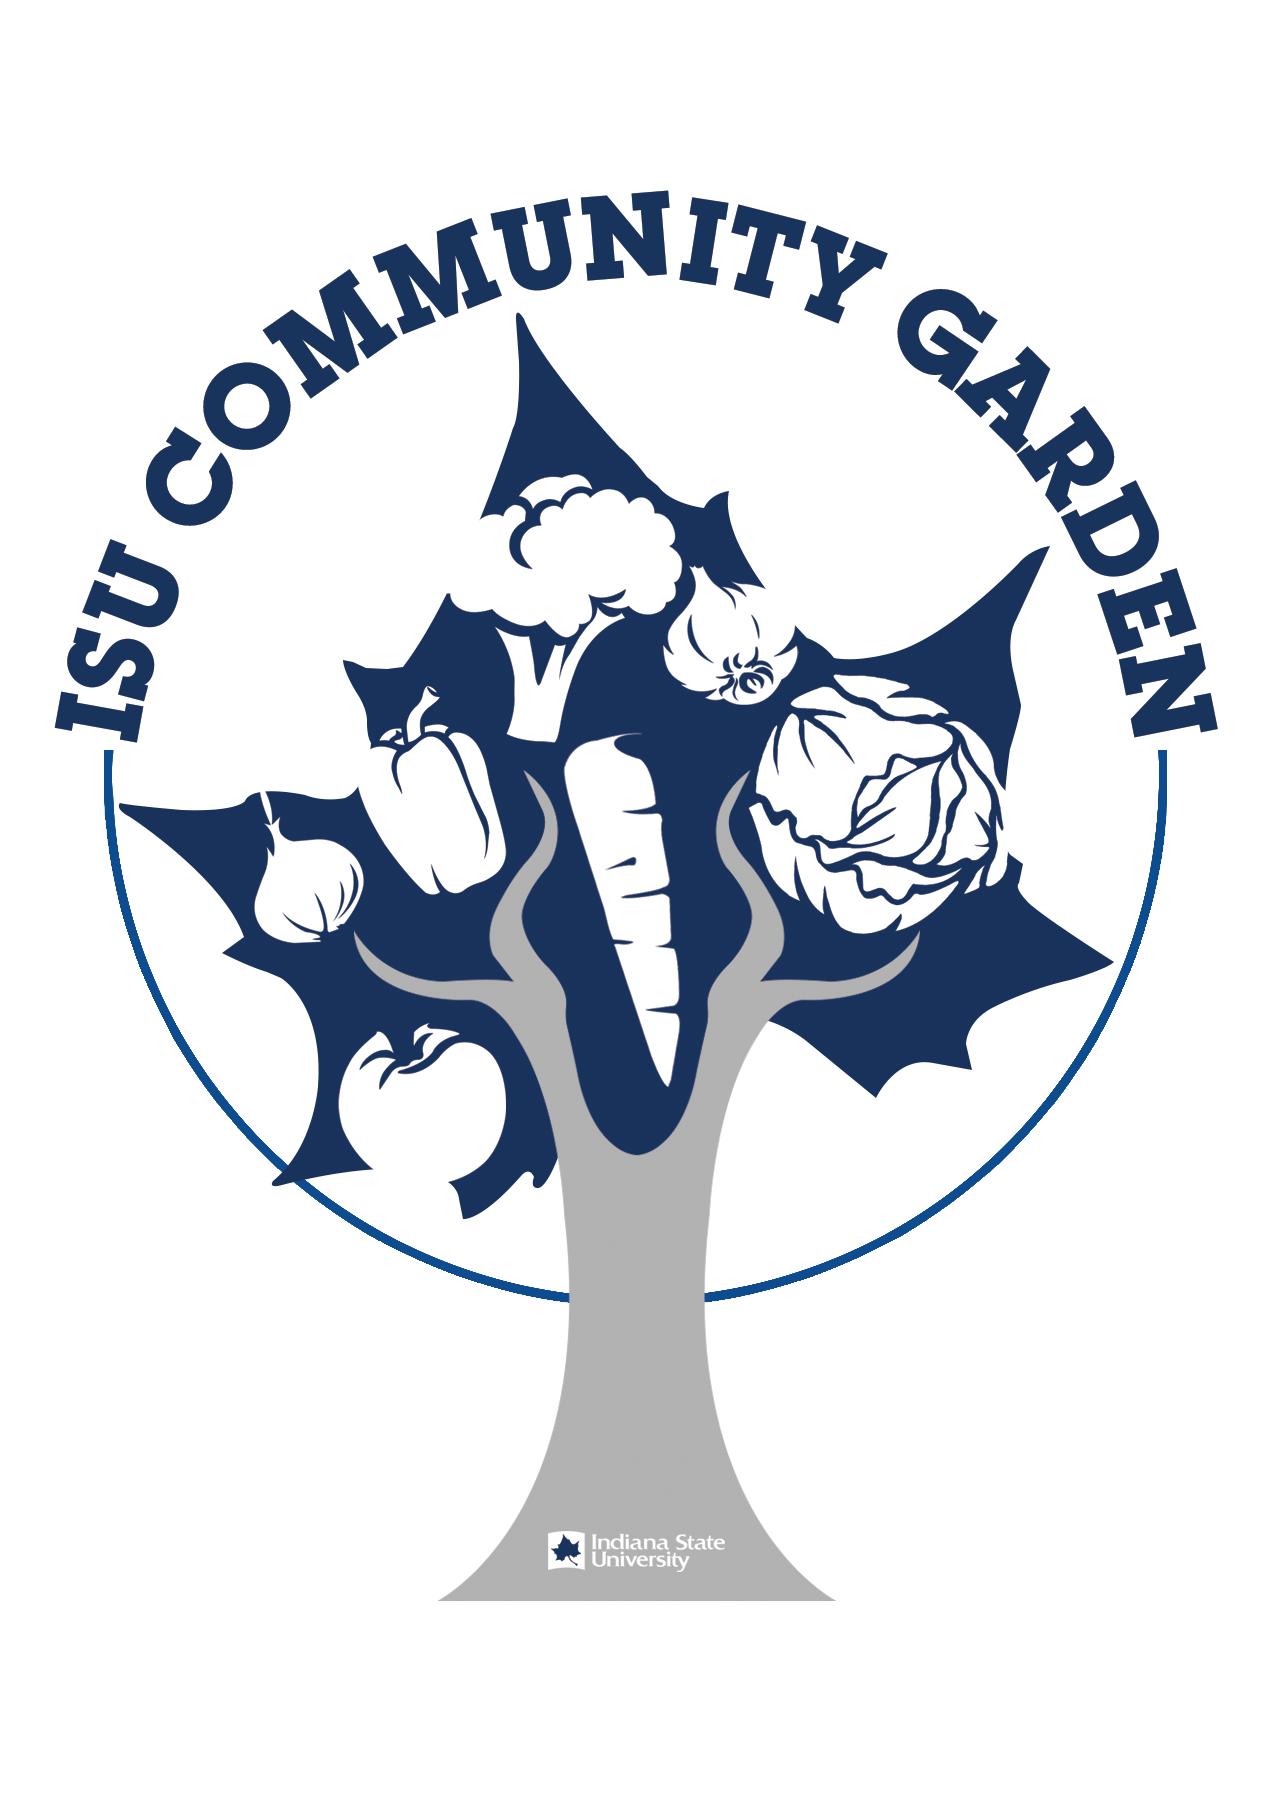 Isu community garden plots. Volunteering clipart gardening